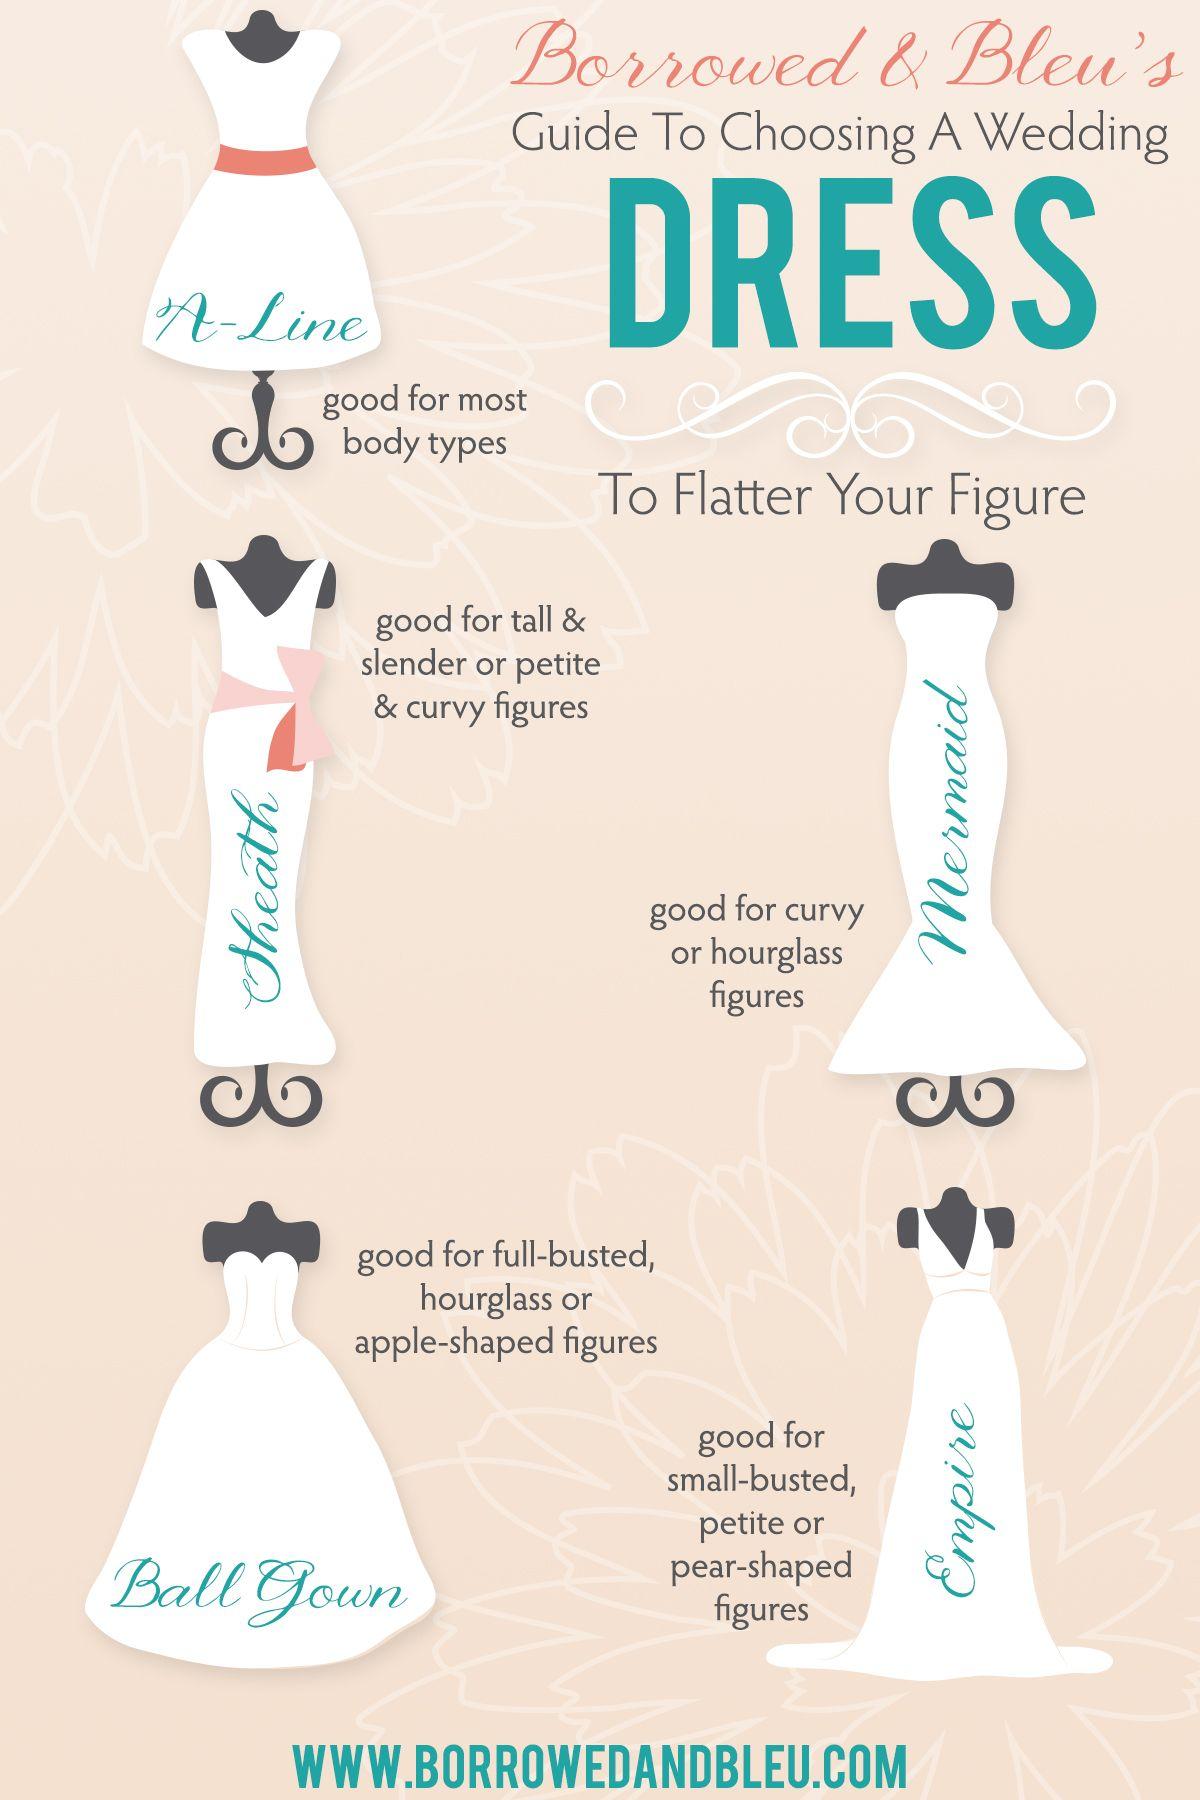 Guide To Choosing A Wedding Dress